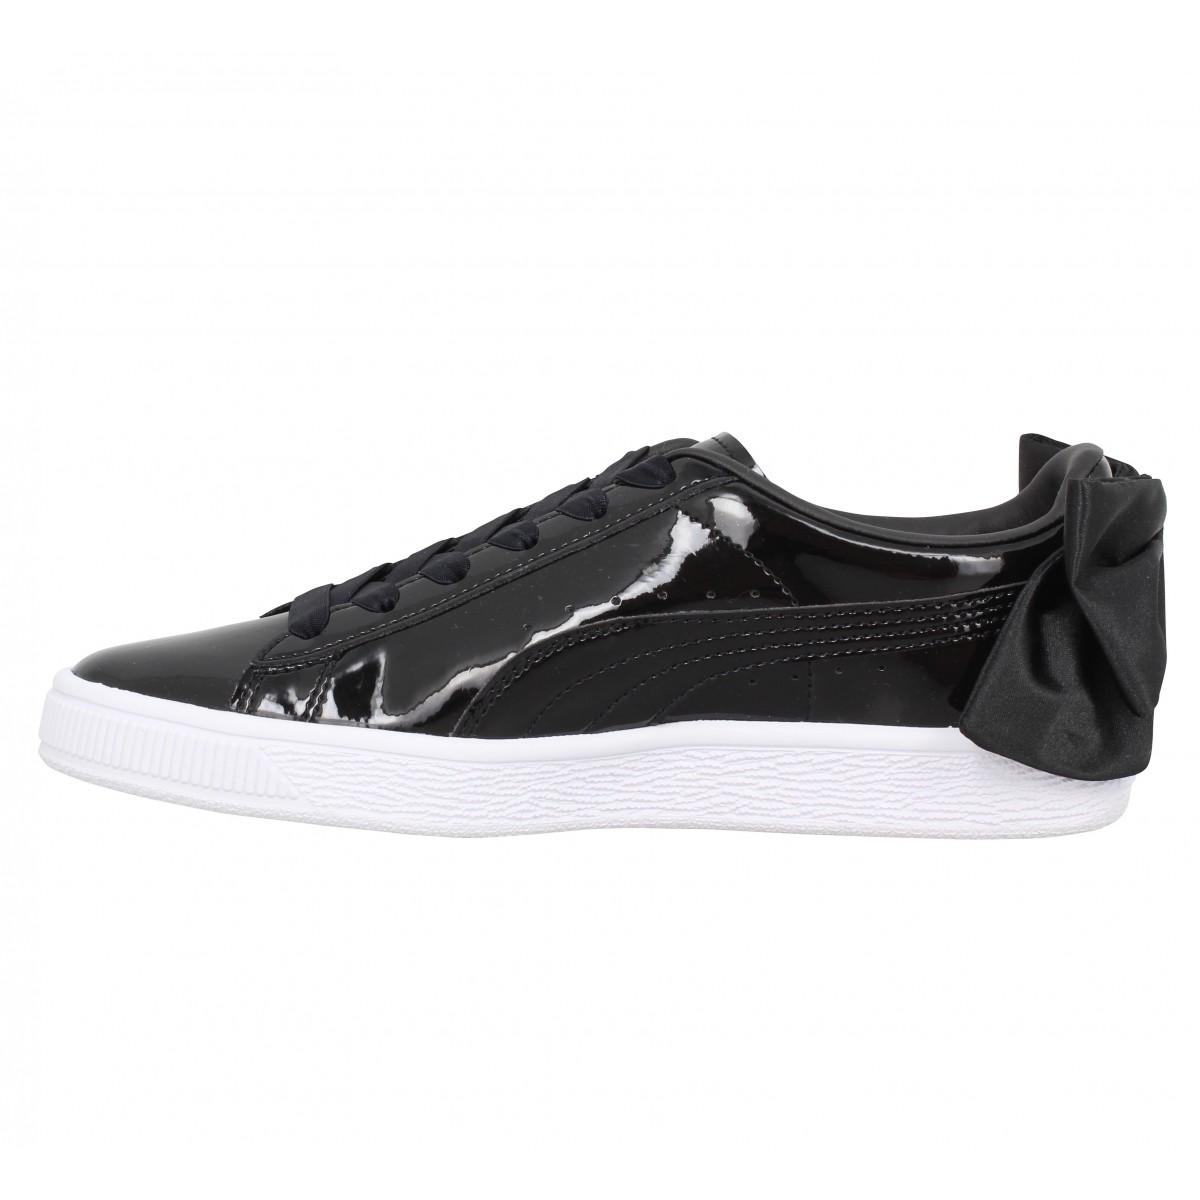 Chaussures Puma suede bow vernis femme noir femme | Fanny chaussures